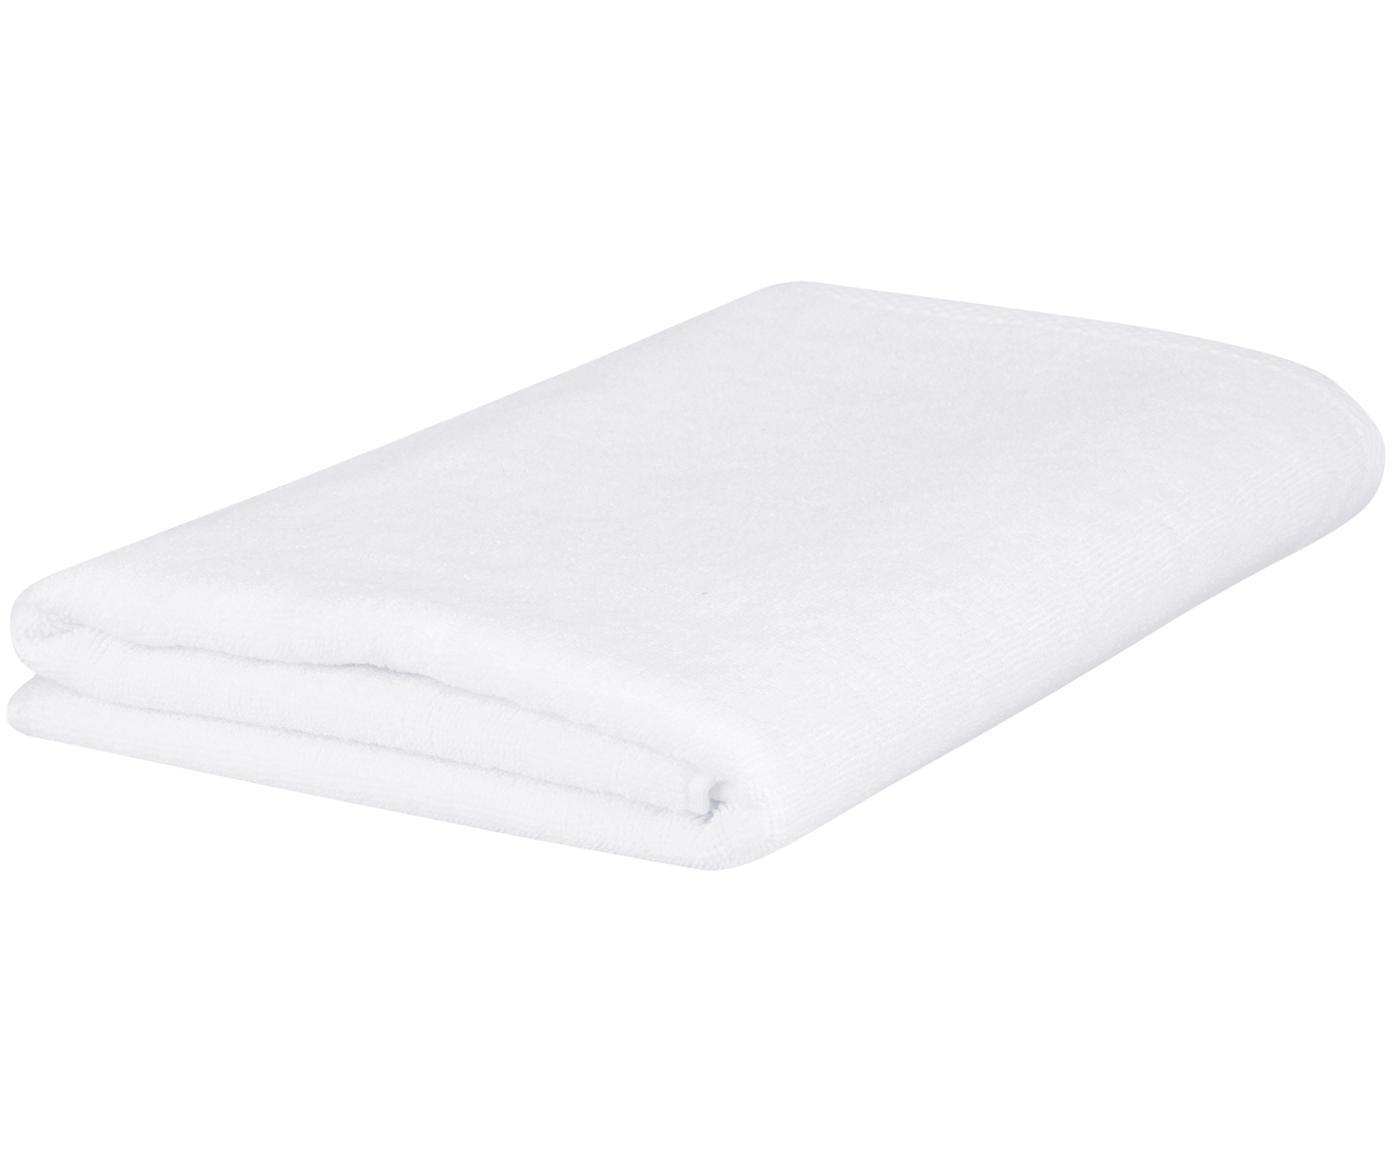 Asciugamano in tinta unita Comfort, Bianco, Telo bagno